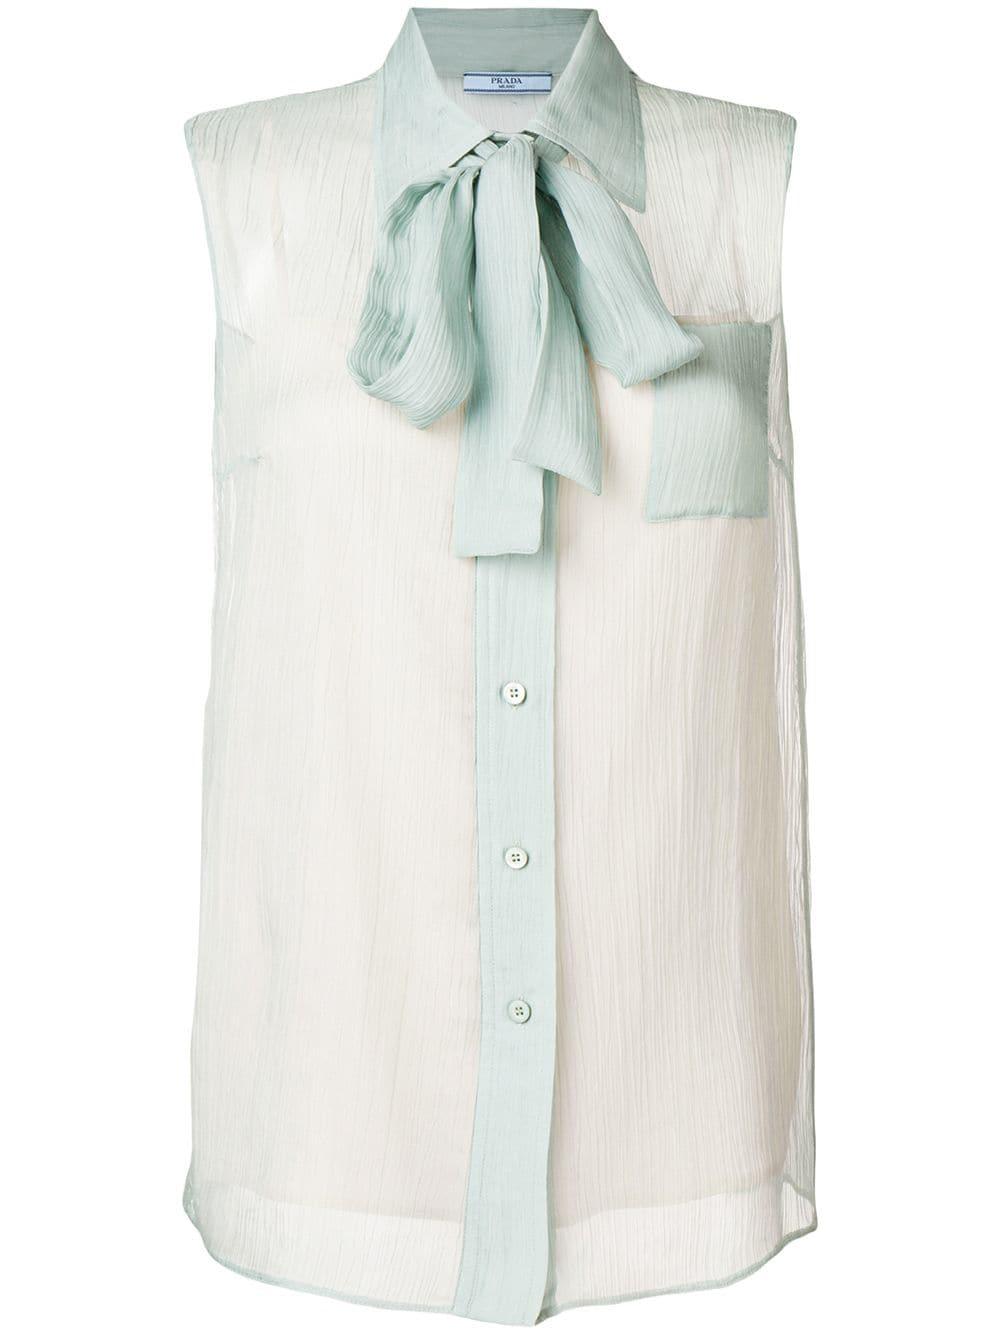 a90ec14e37663 Prada Crinkled Silk Chiffon Blouse In Blue